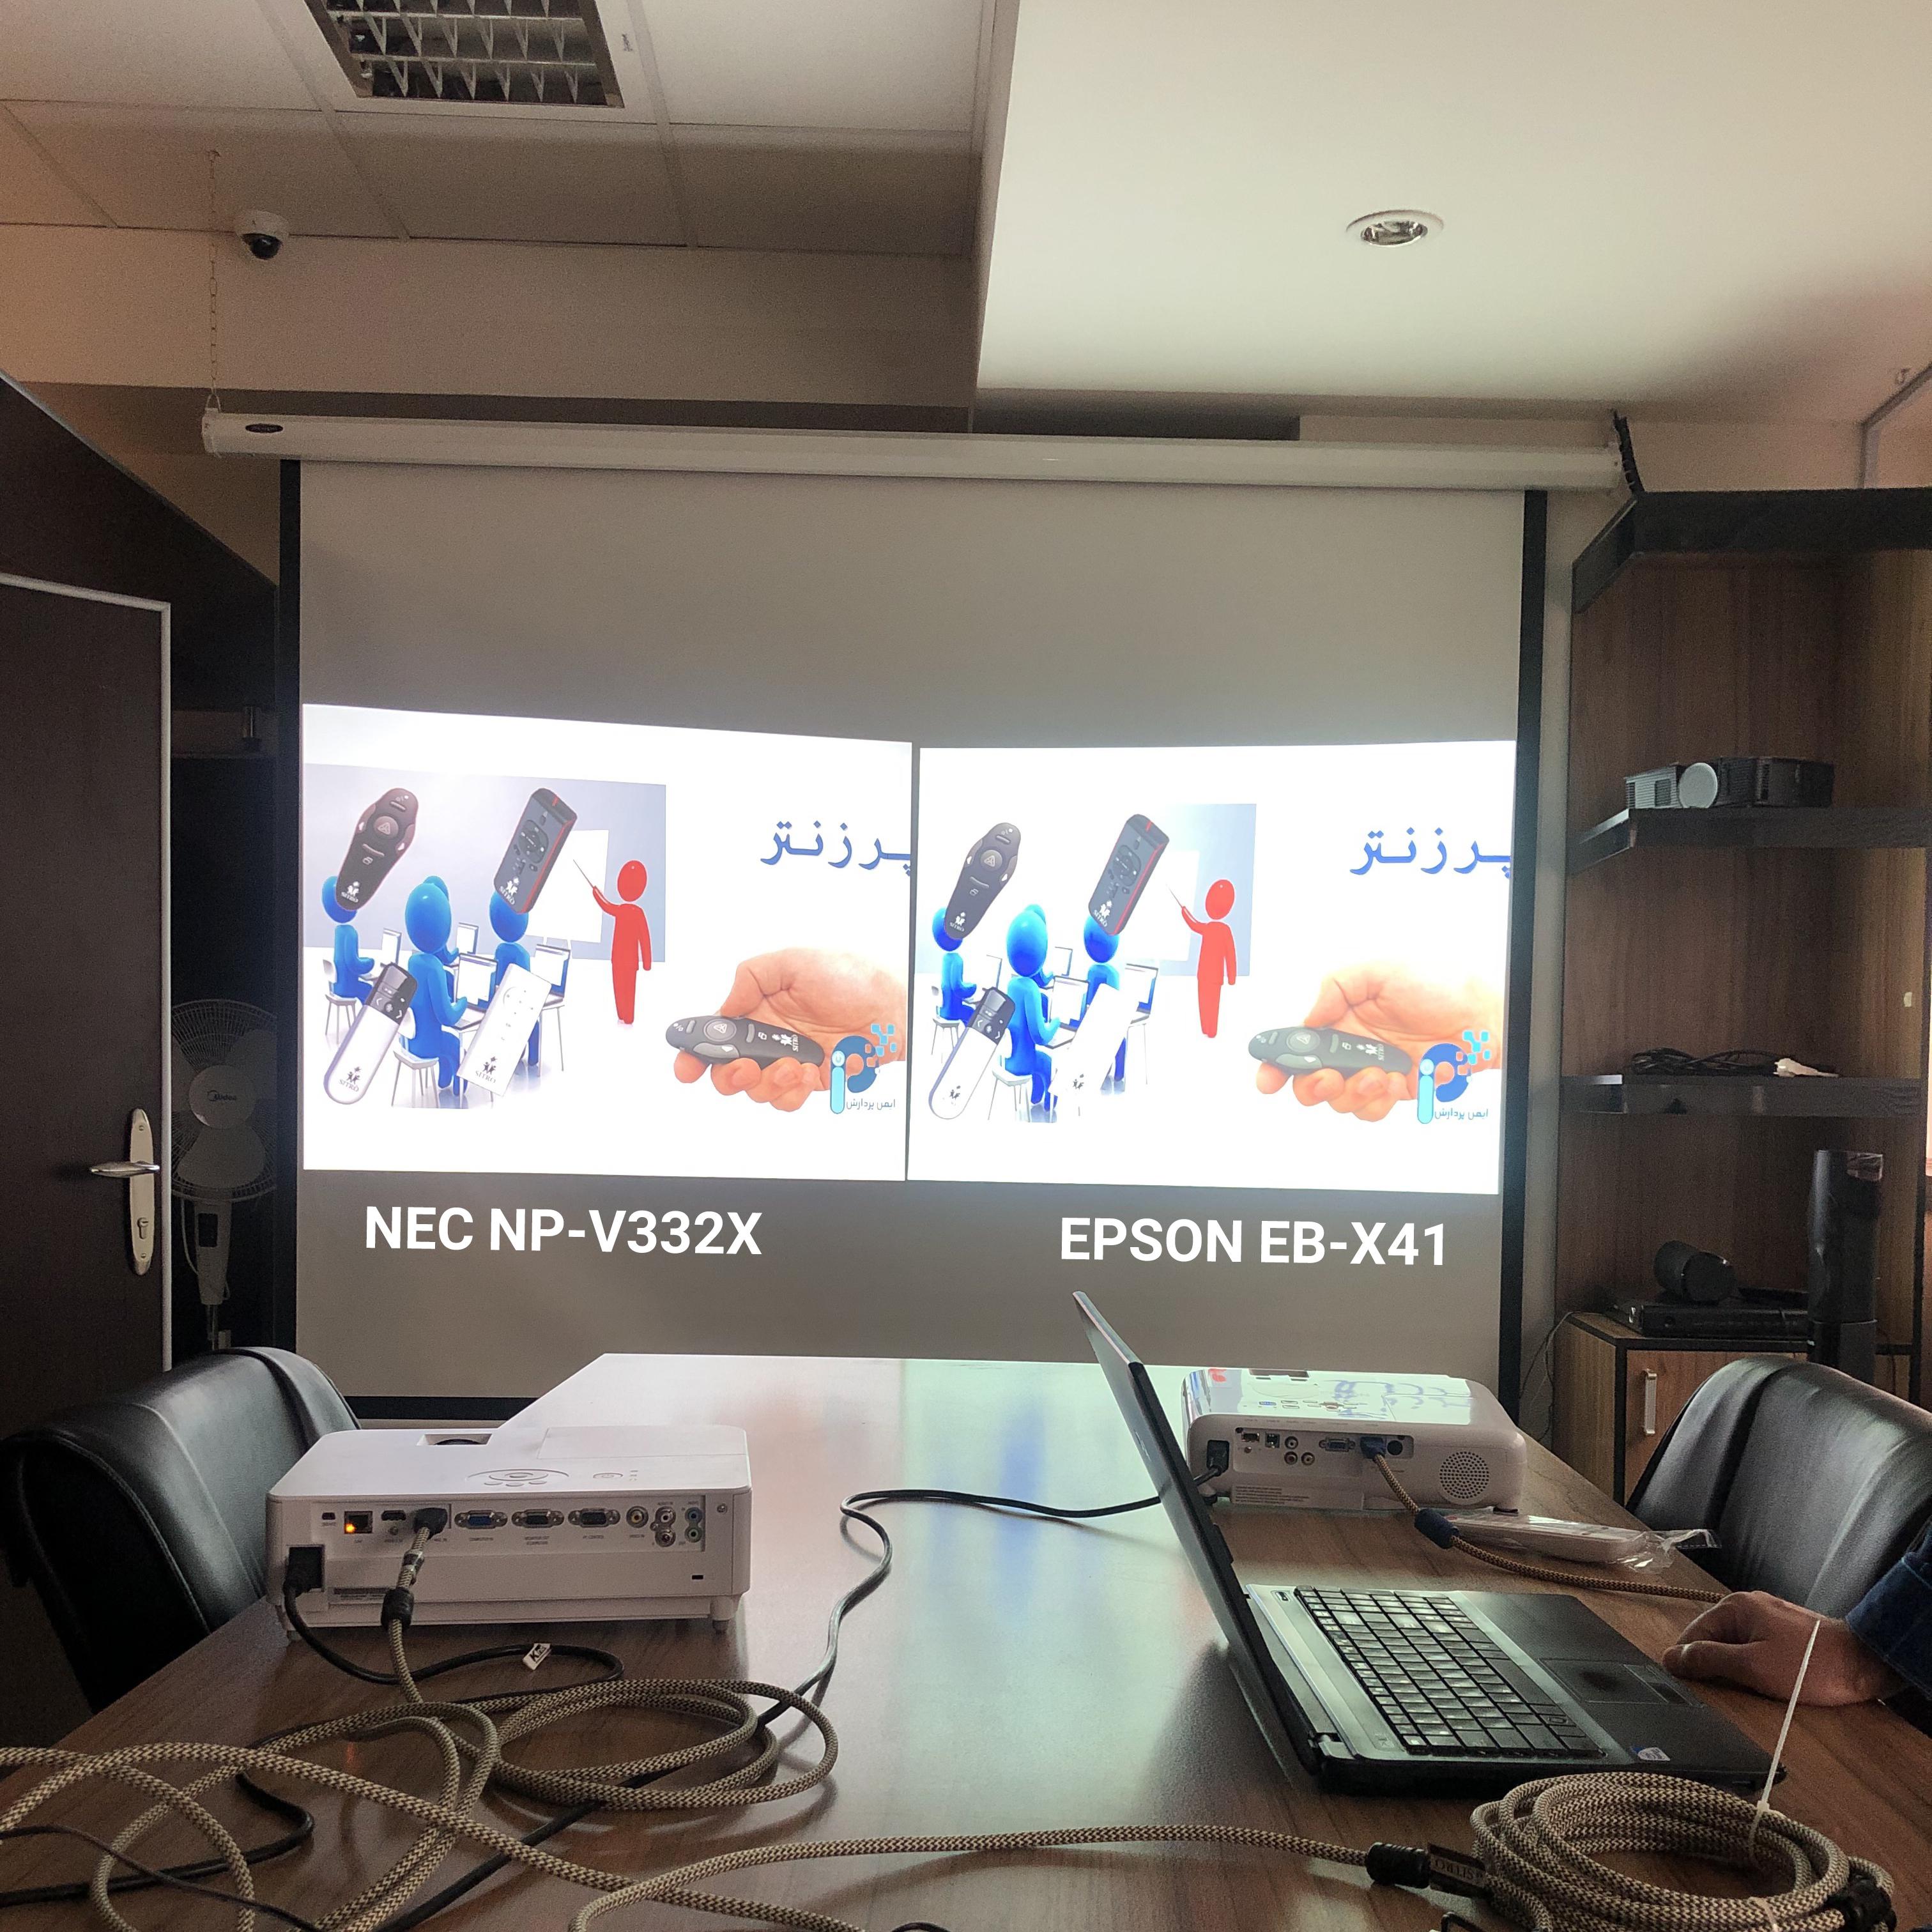 EPSON EB-X41 VS NEC NP-V332X